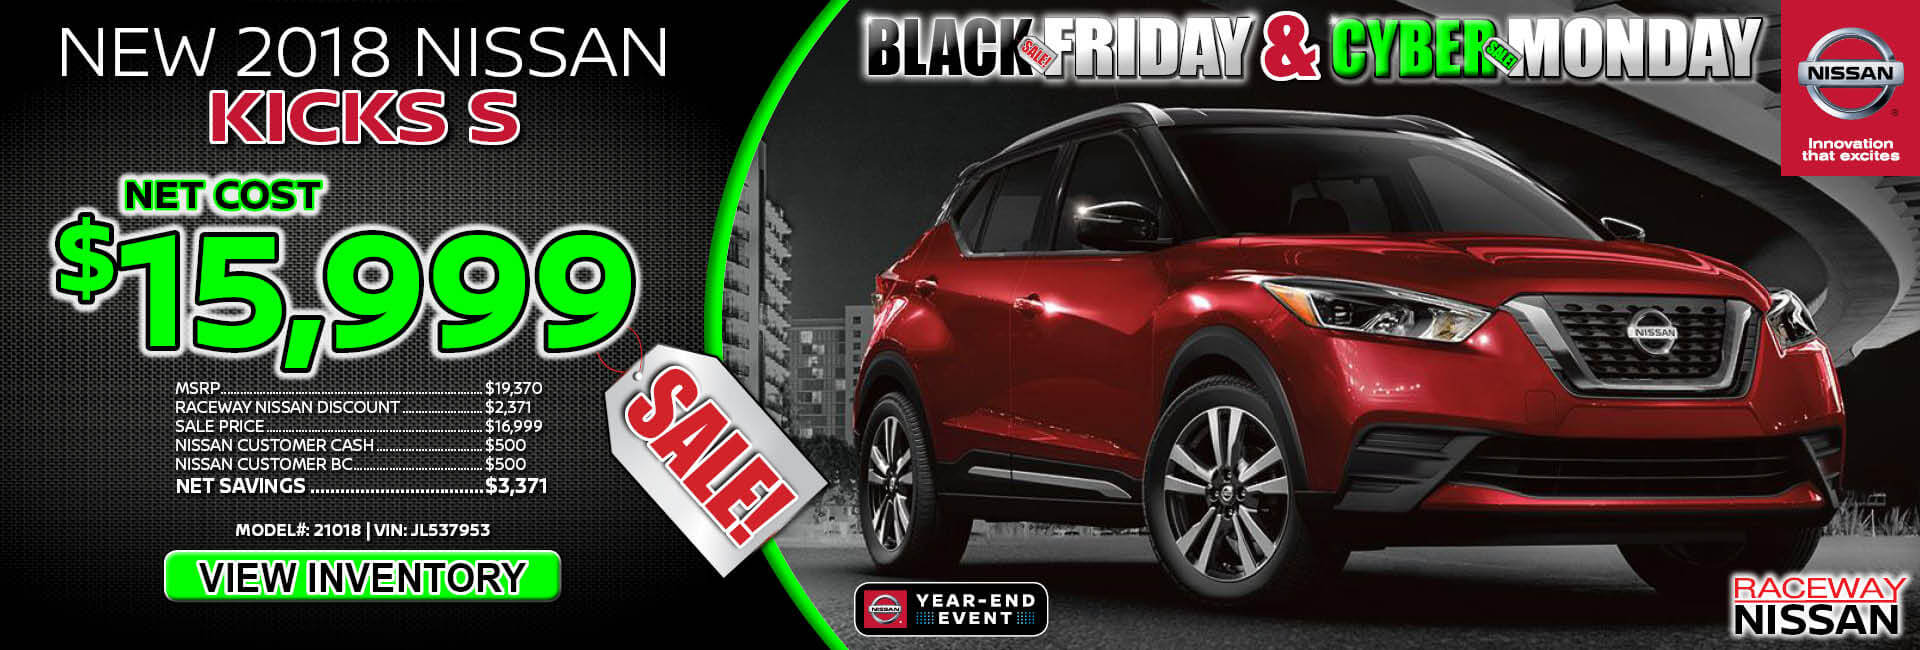 Nissan Kicks $15,999 Purchase